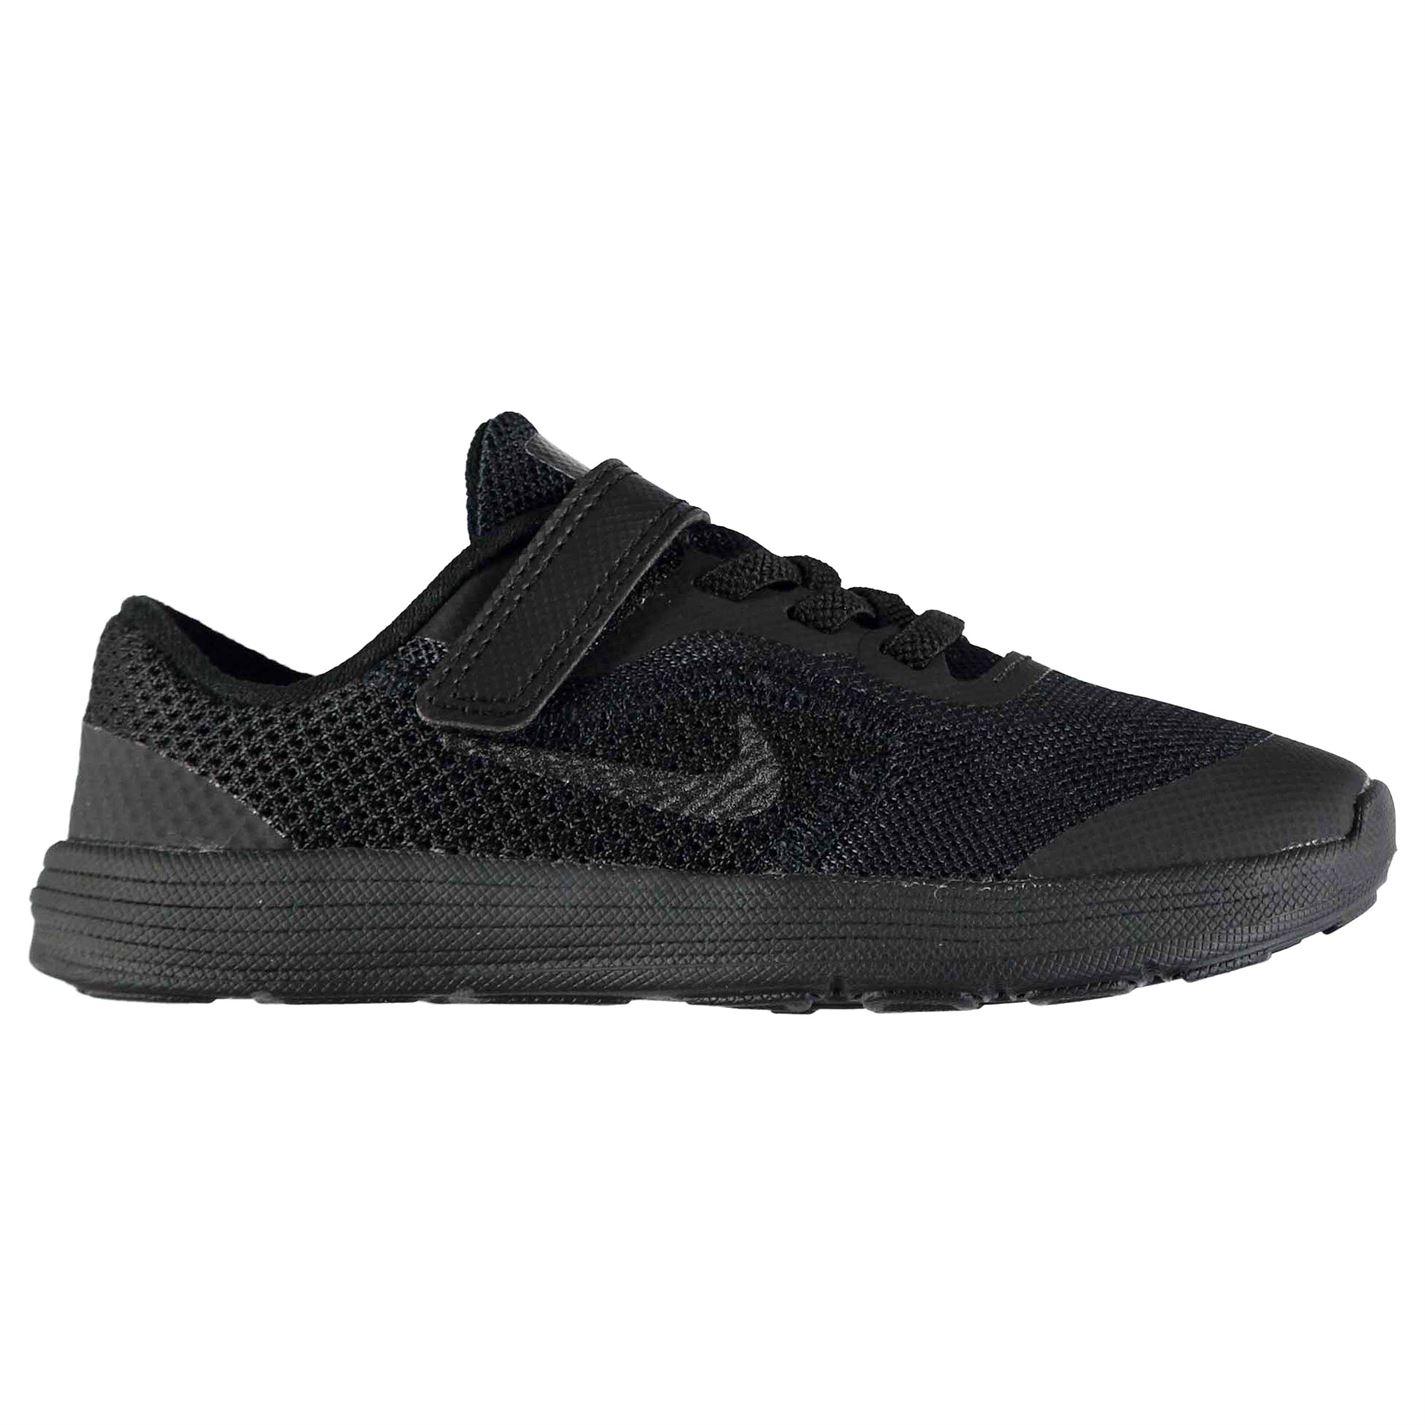 Nike Revolution 3 Trainers Infant Boys Black Black - Glami.sk 978a6bce663